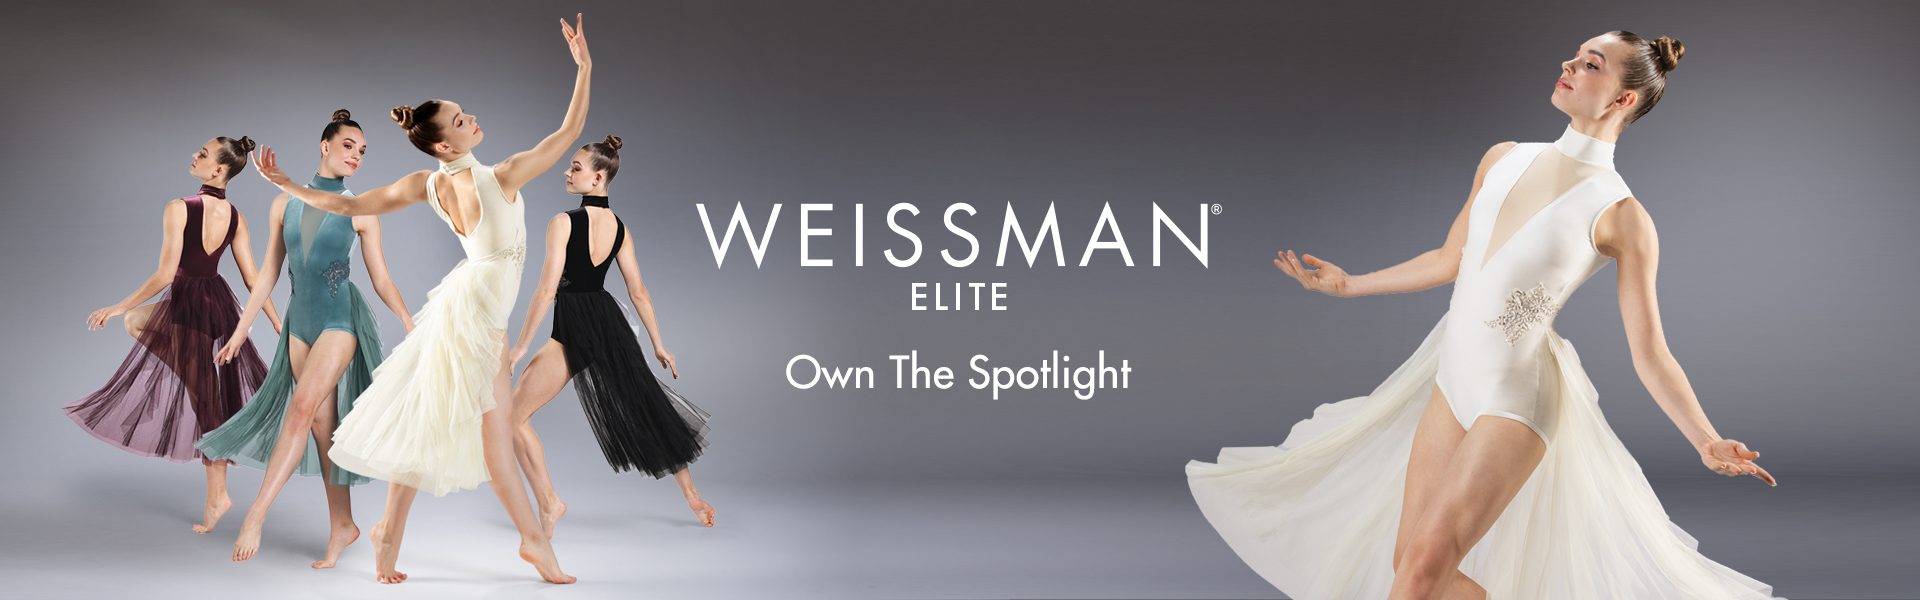 Shop New Elite styles